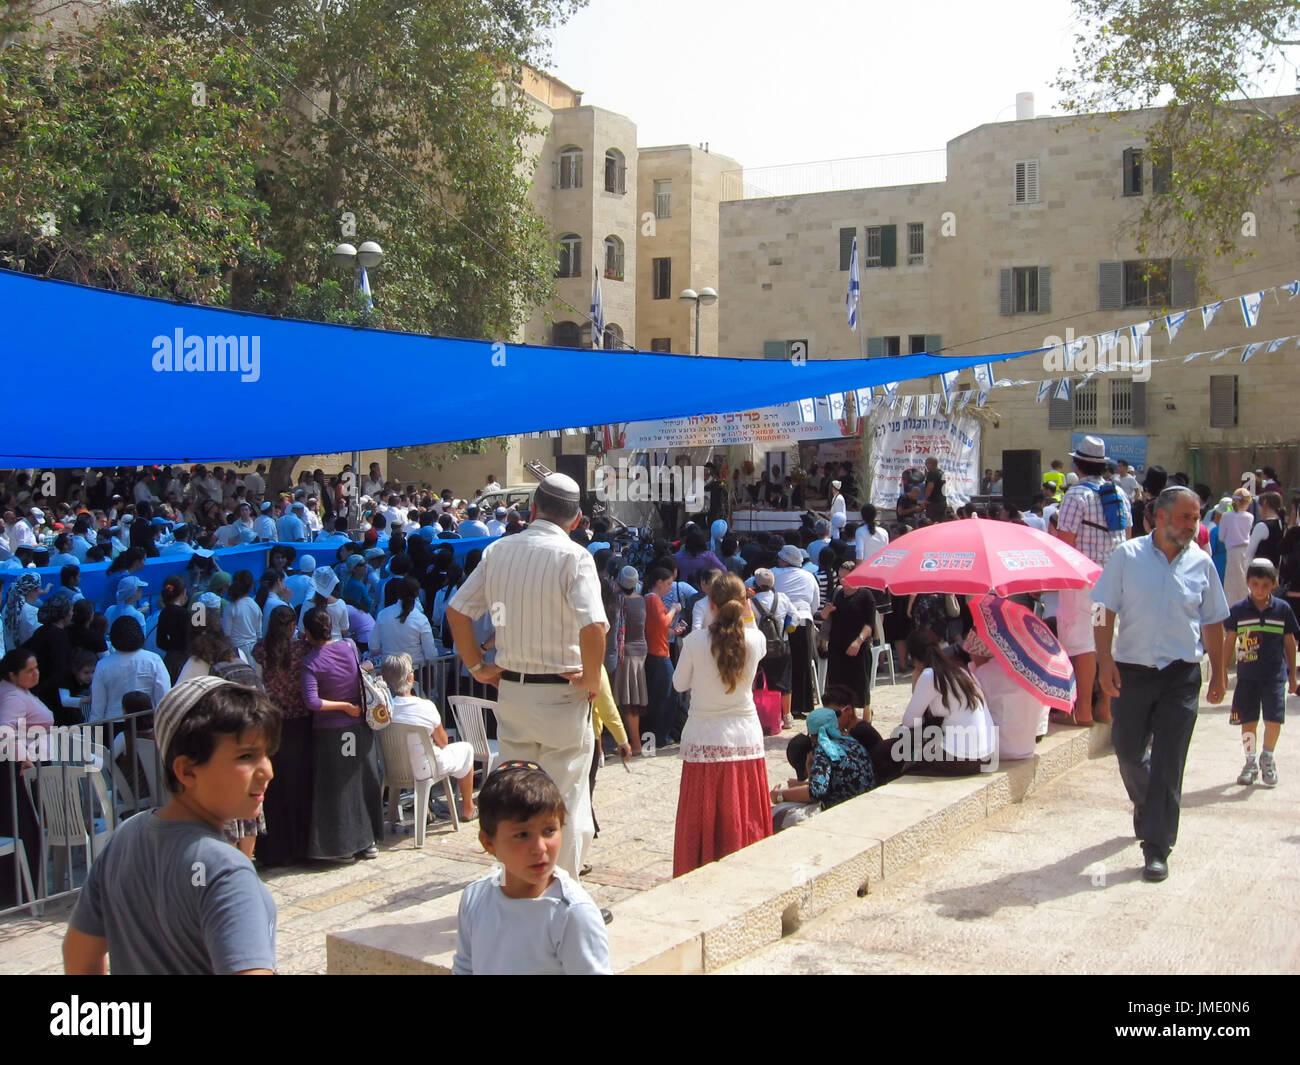 A crowd of Jewish people celebrate Sukkot in the Jerusalem Old City Jewish Quarter. - Stock Image